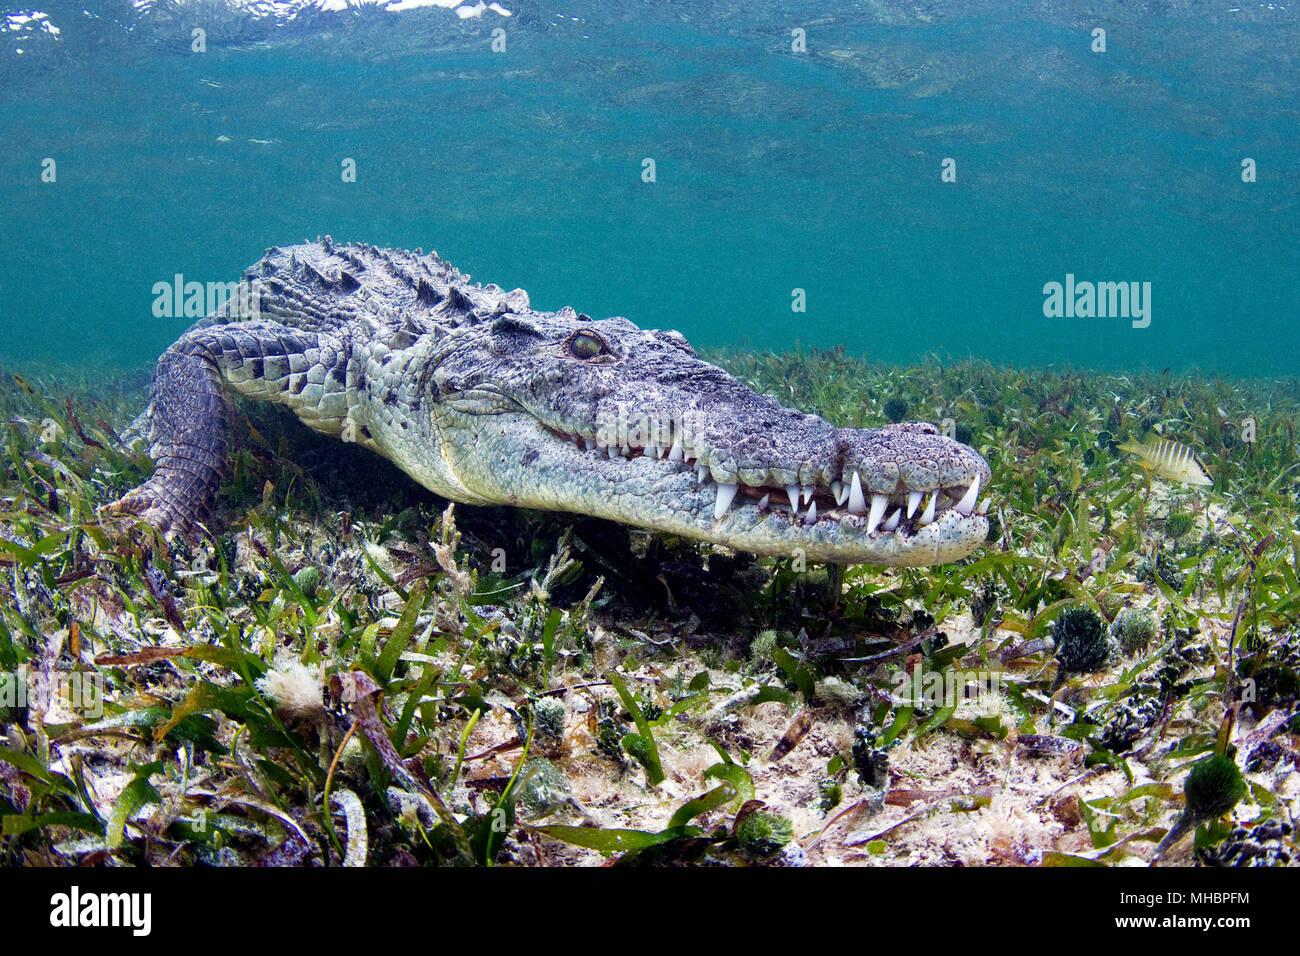 American crocodile (Crocodylus acutus), Underwater, Banco Chinchorro, Quintana Roo, Mexico Stock Photo